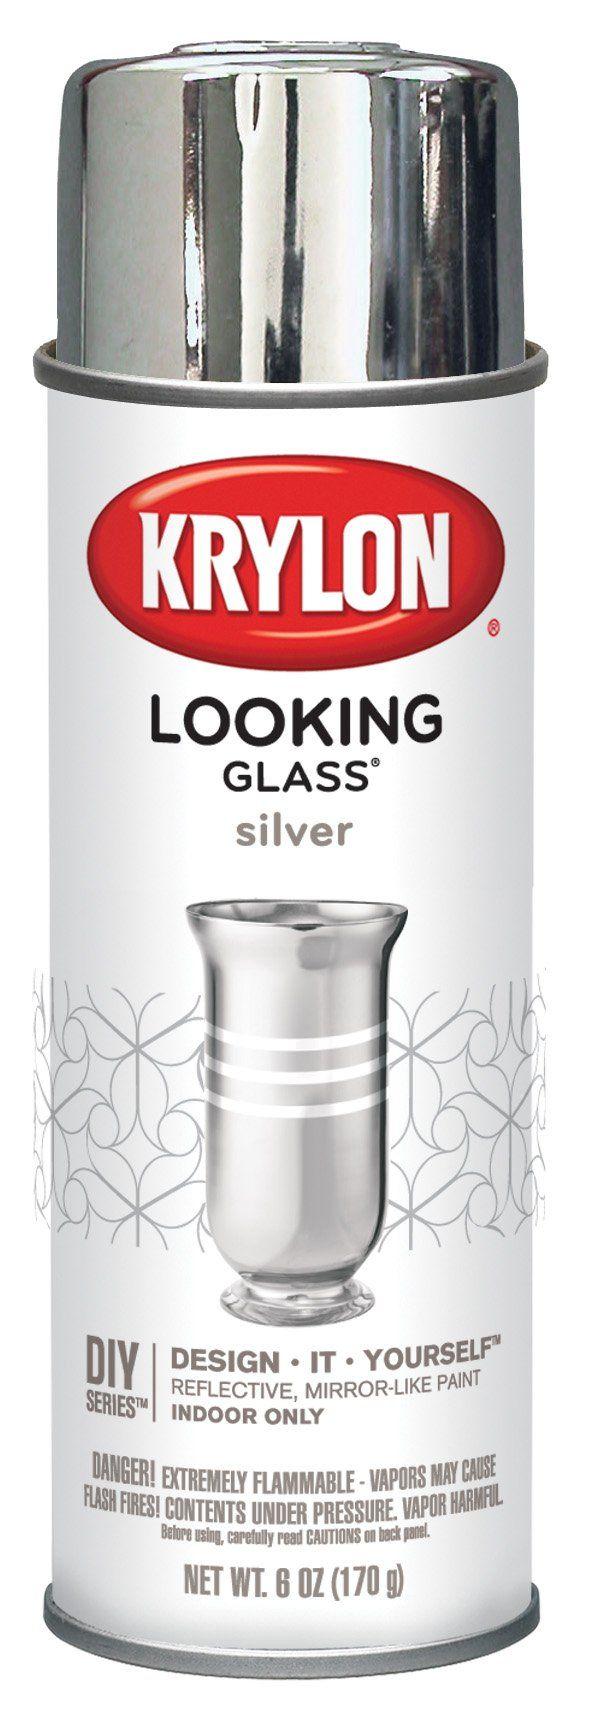 aerosol spray paint krylon looking glass looking glass paint mason jar. Black Bedroom Furniture Sets. Home Design Ideas